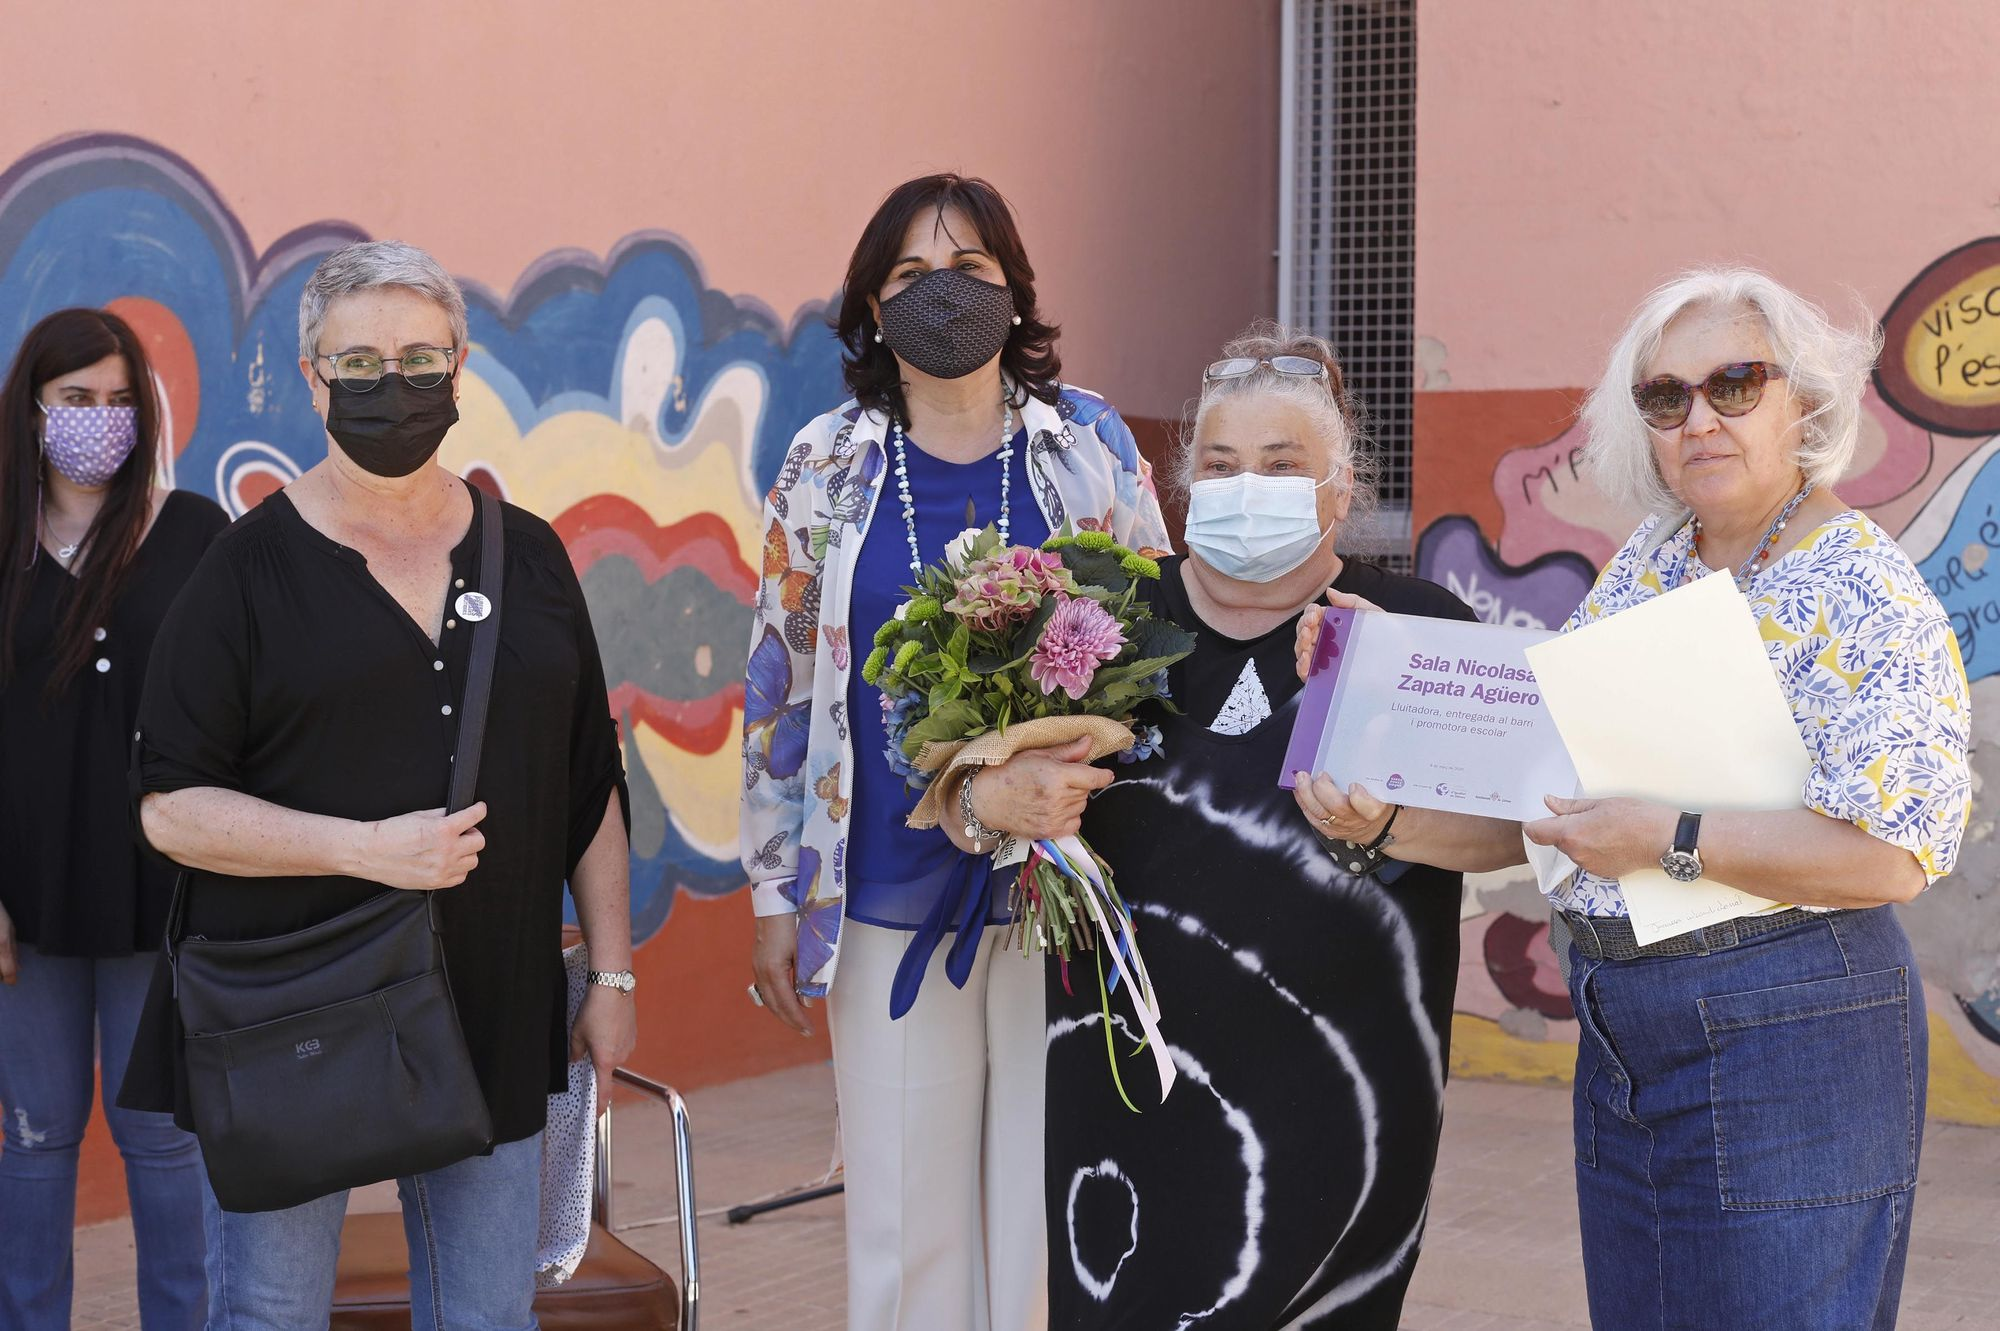 Homenatge a Nicolasa Zapata per la seva tasca educativa a la Font de la Pólvora